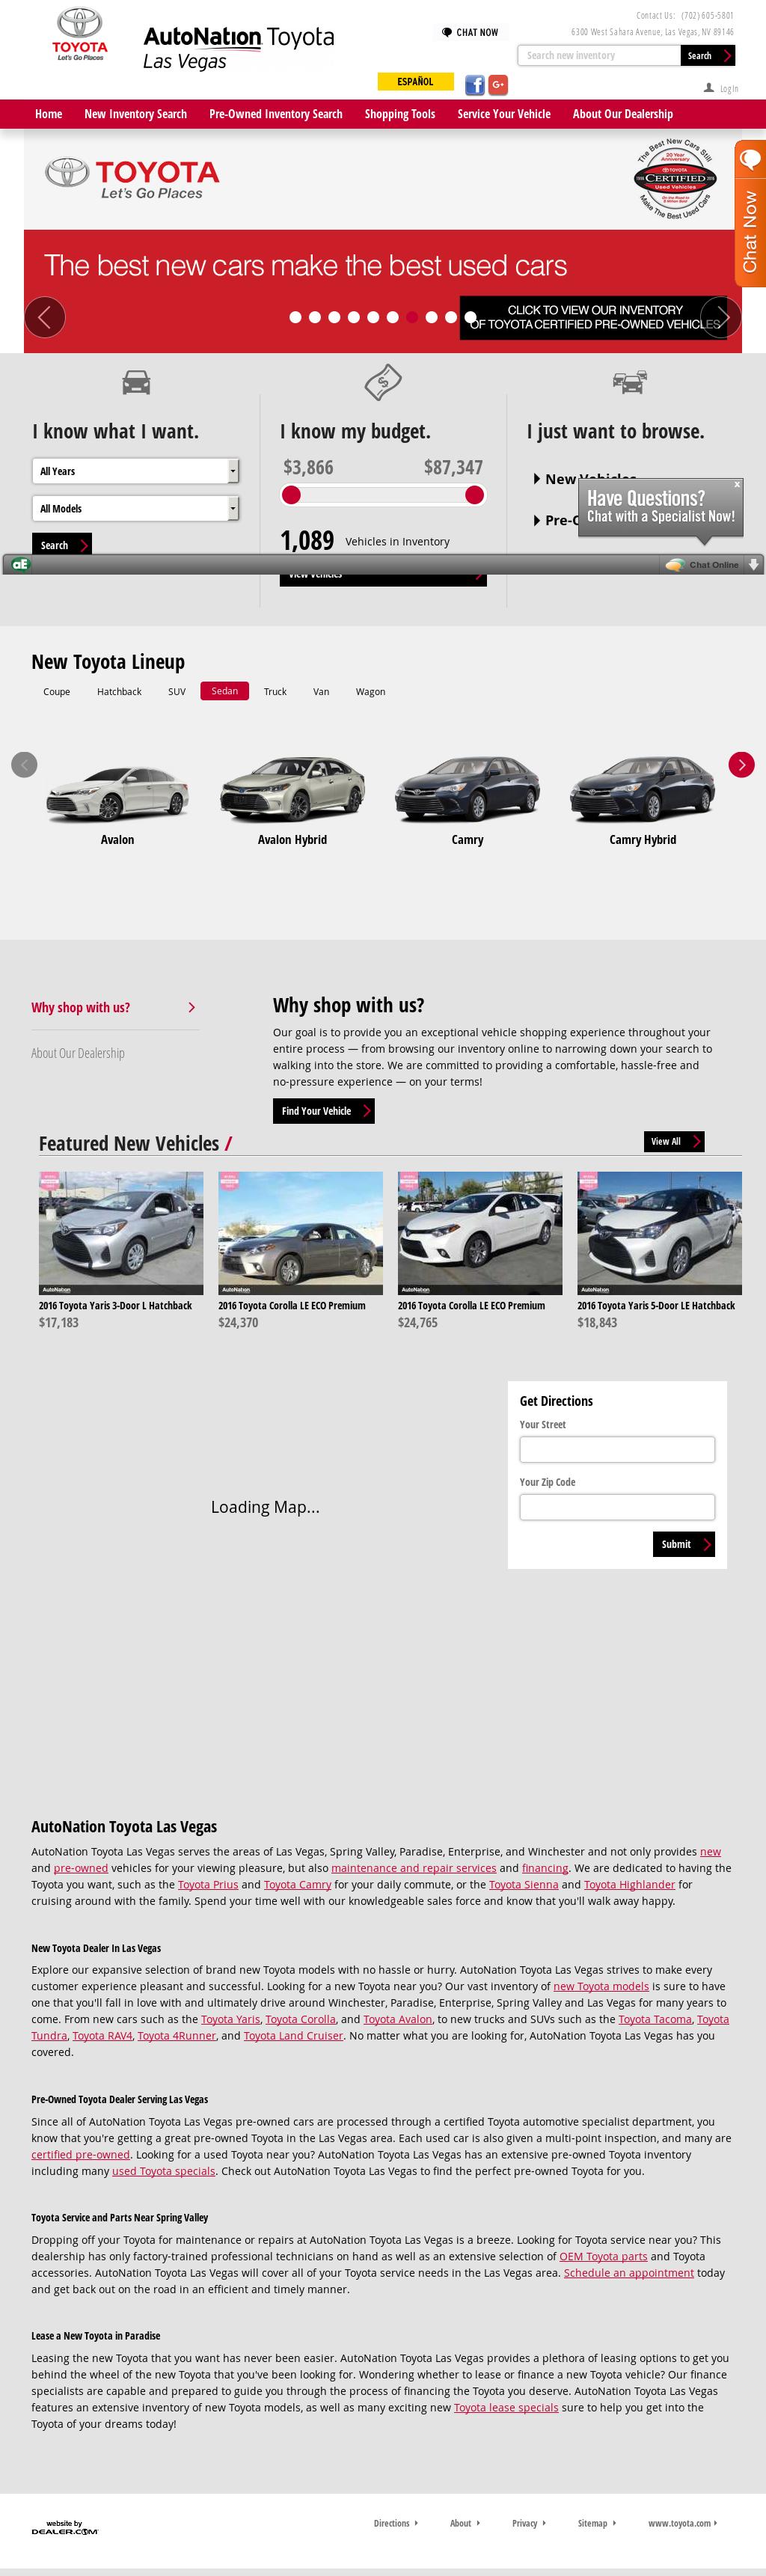 Autonation Toyota Scion Las Vegas Website History